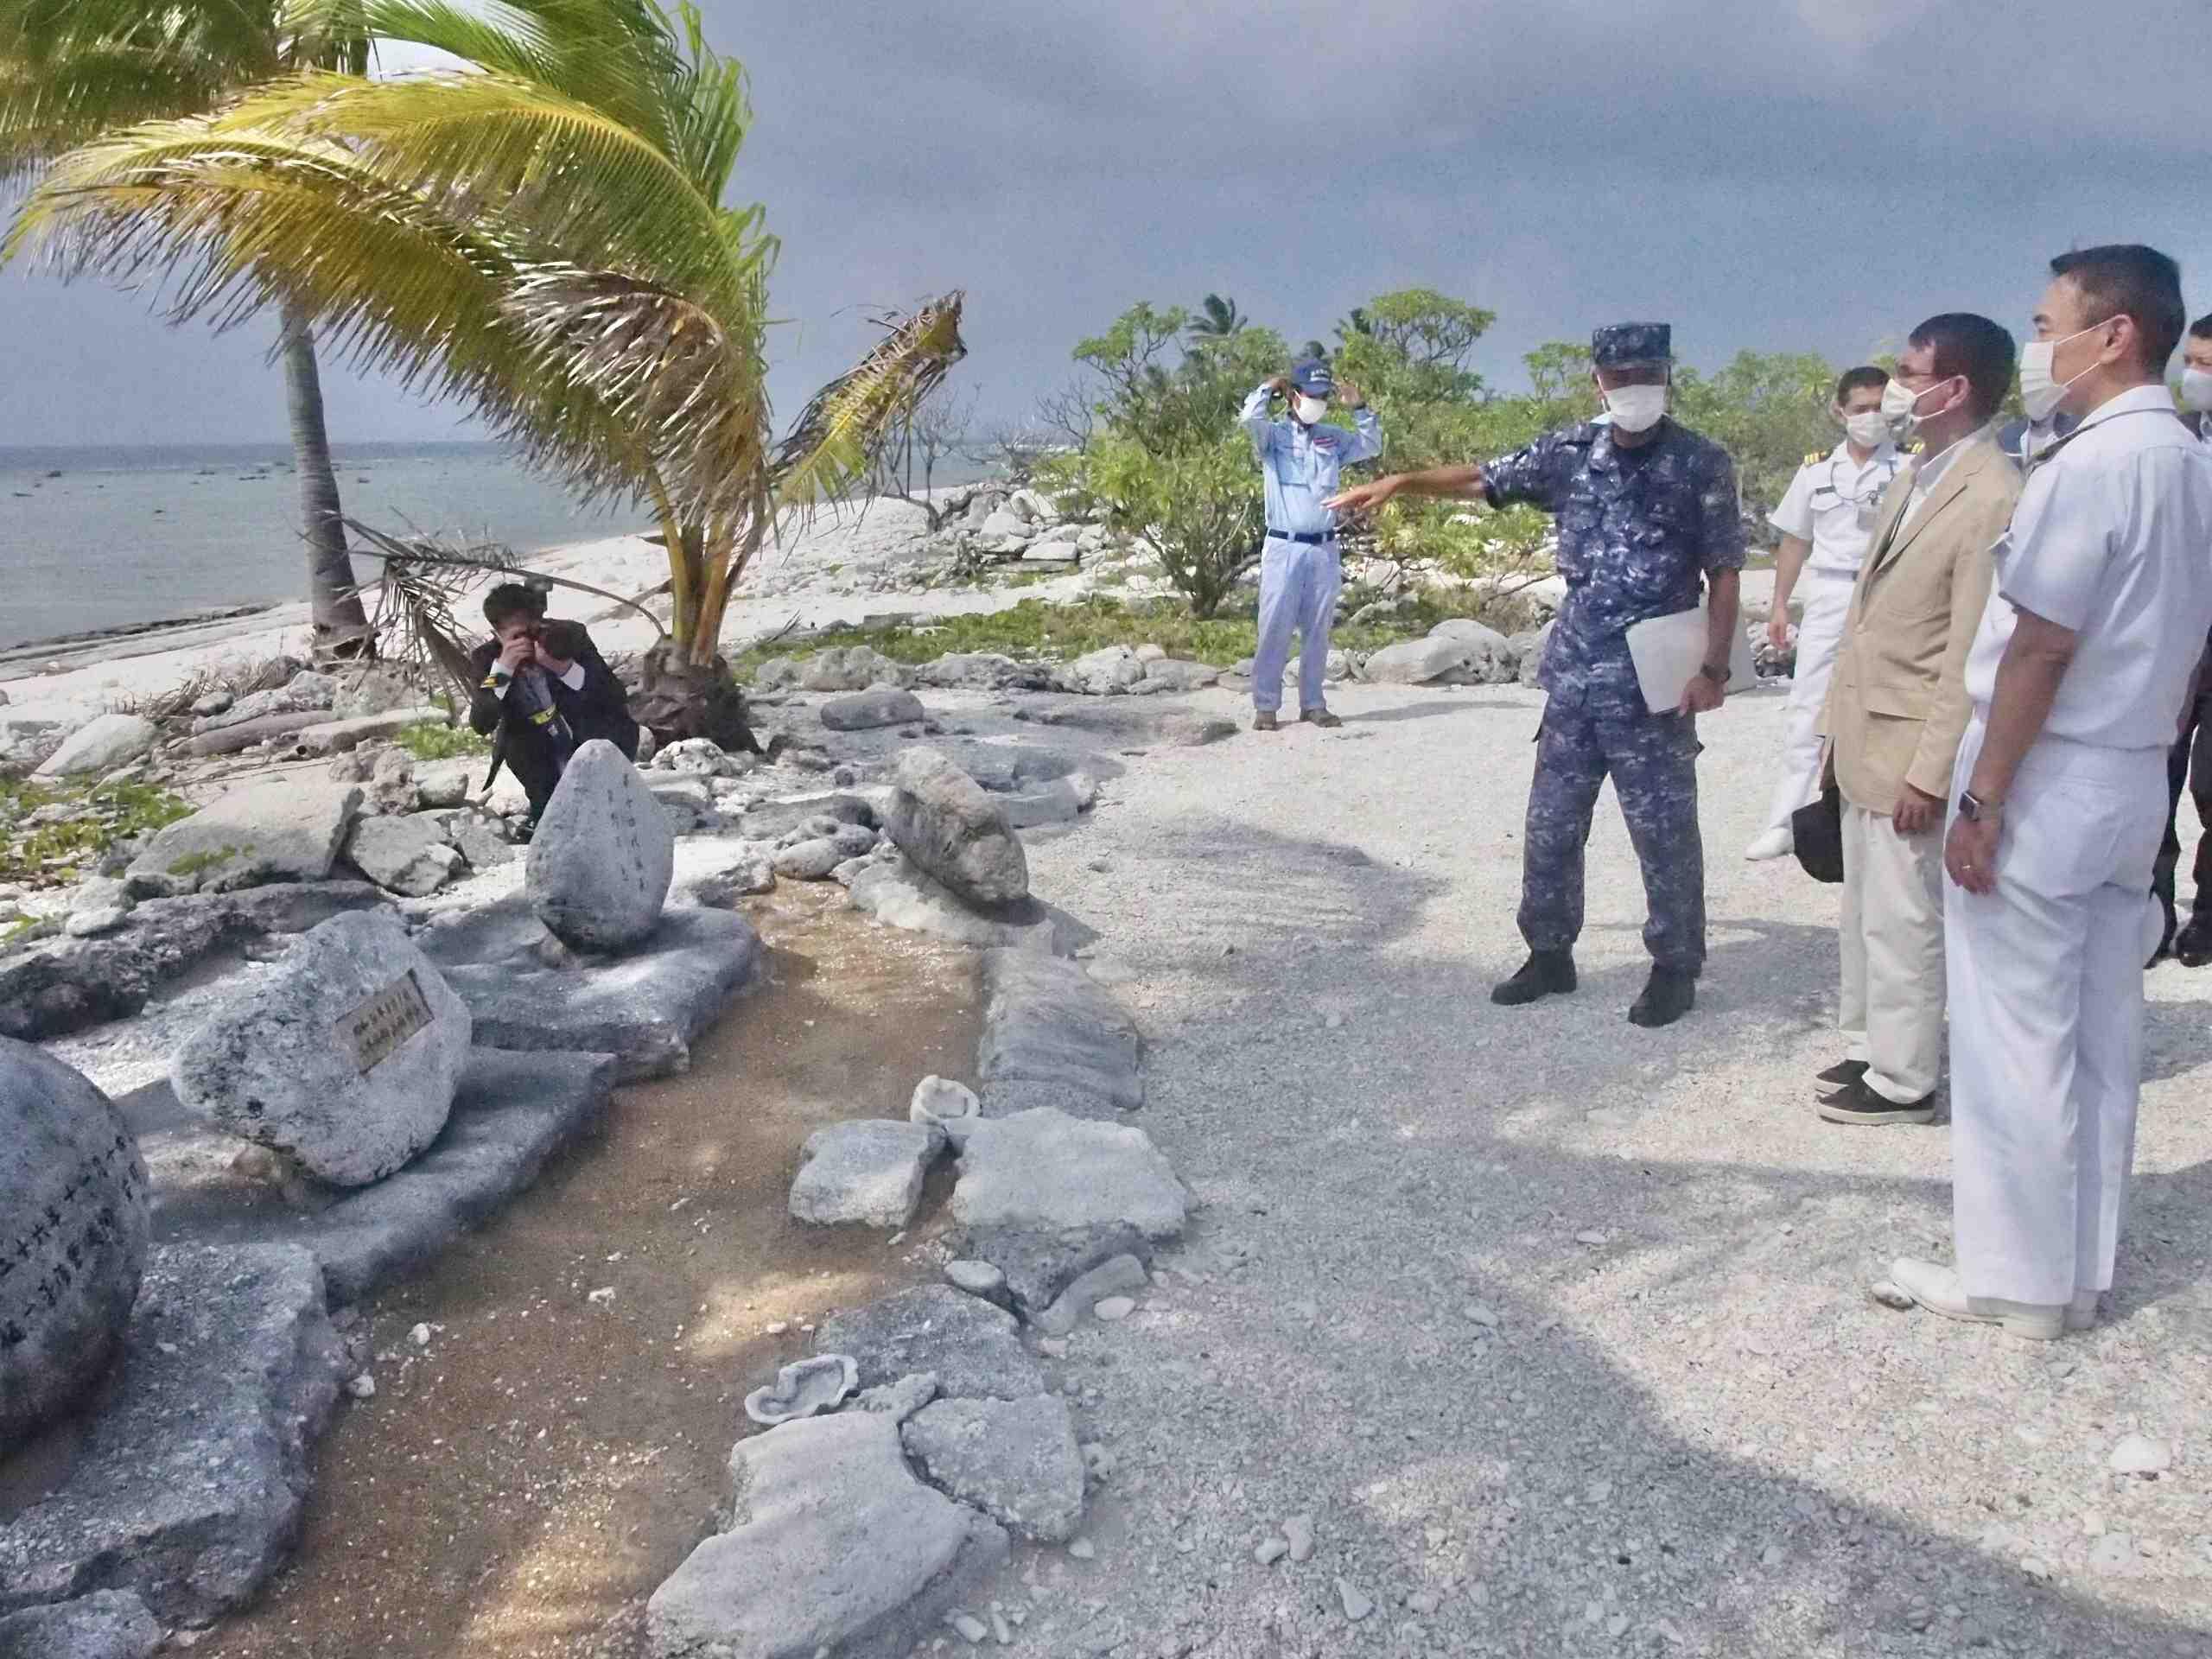 Minamitorishima Island and Defence Minister Taro Kono